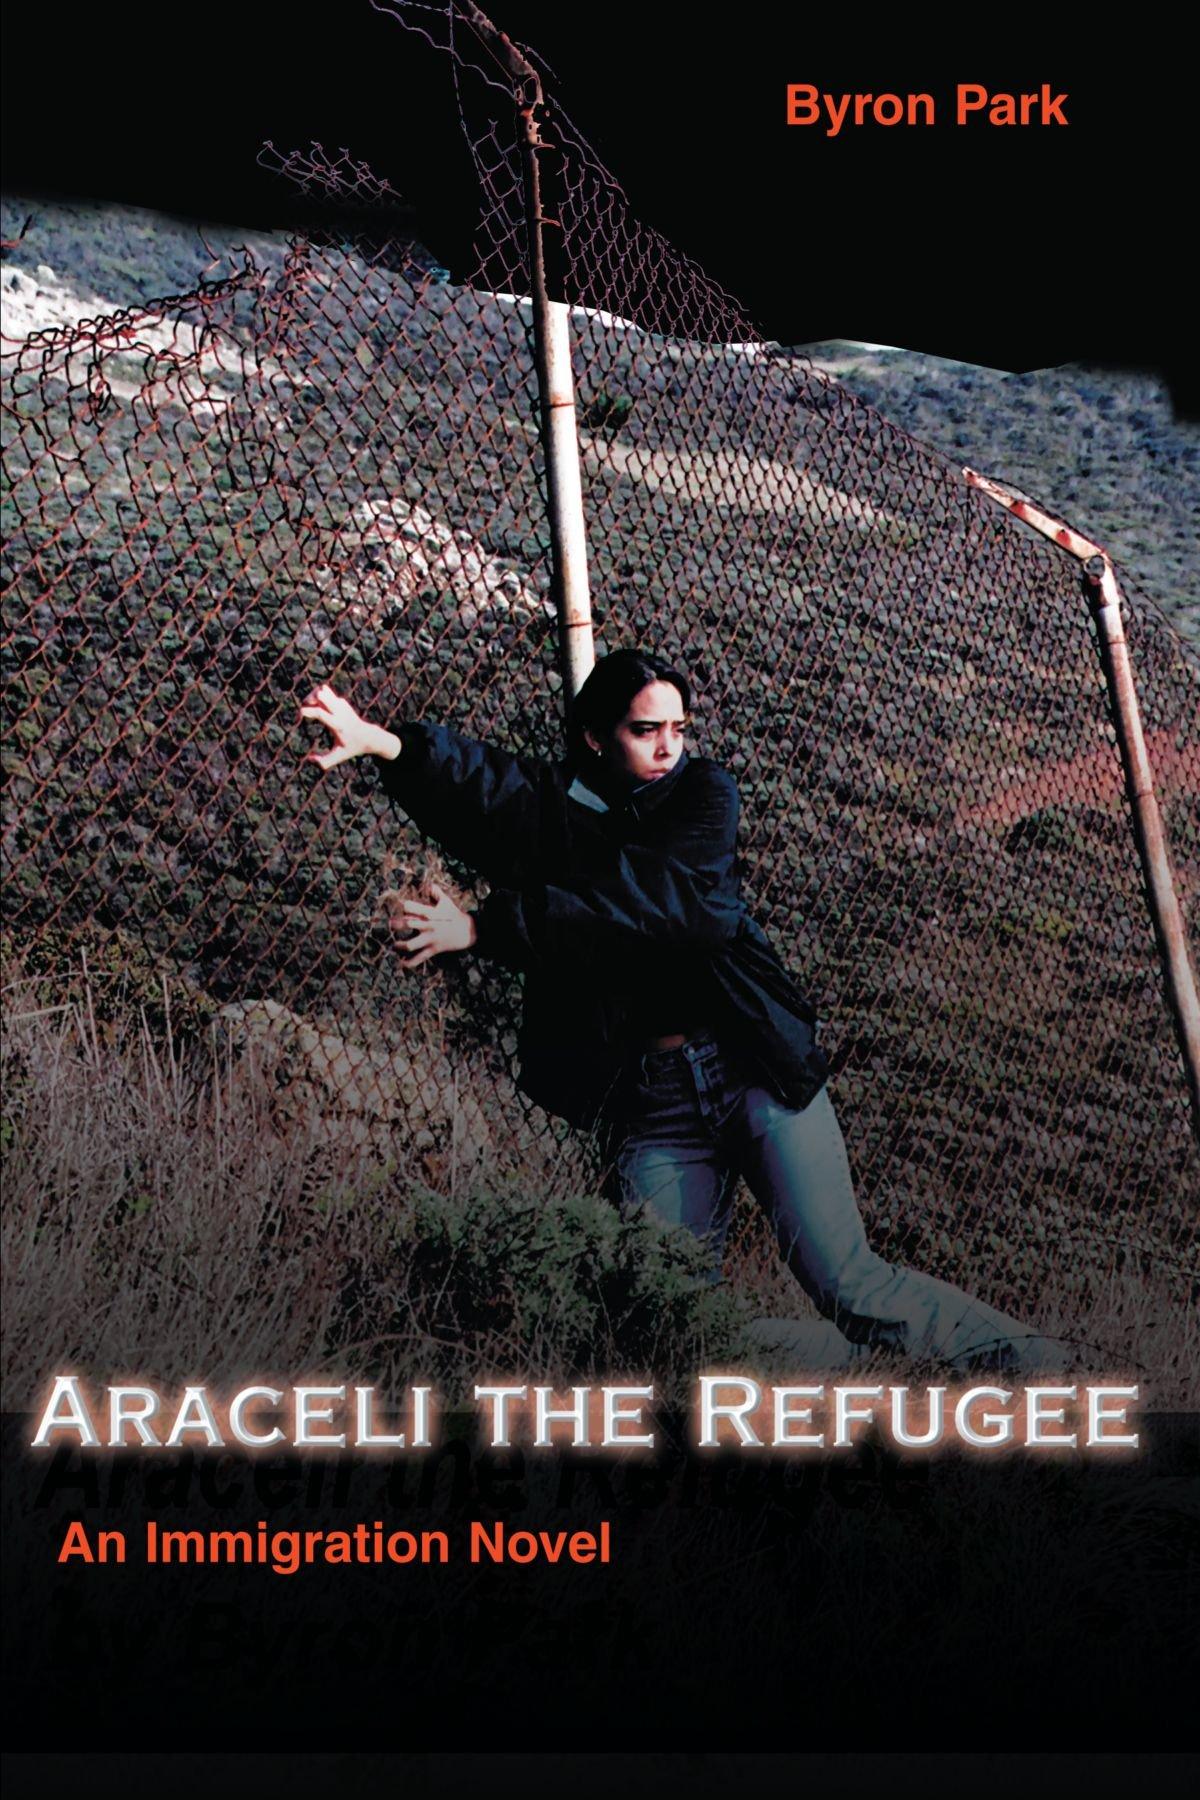 Araceli the Refugee: An Immigration Novel ePub fb2 book